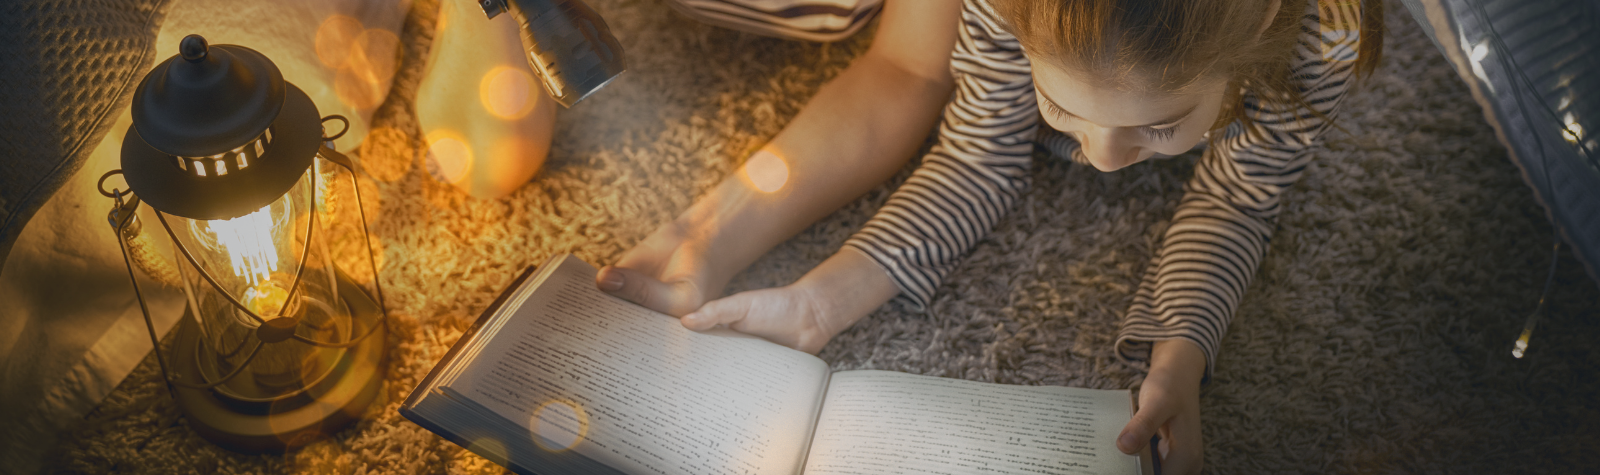 Engaging Children in Literacy